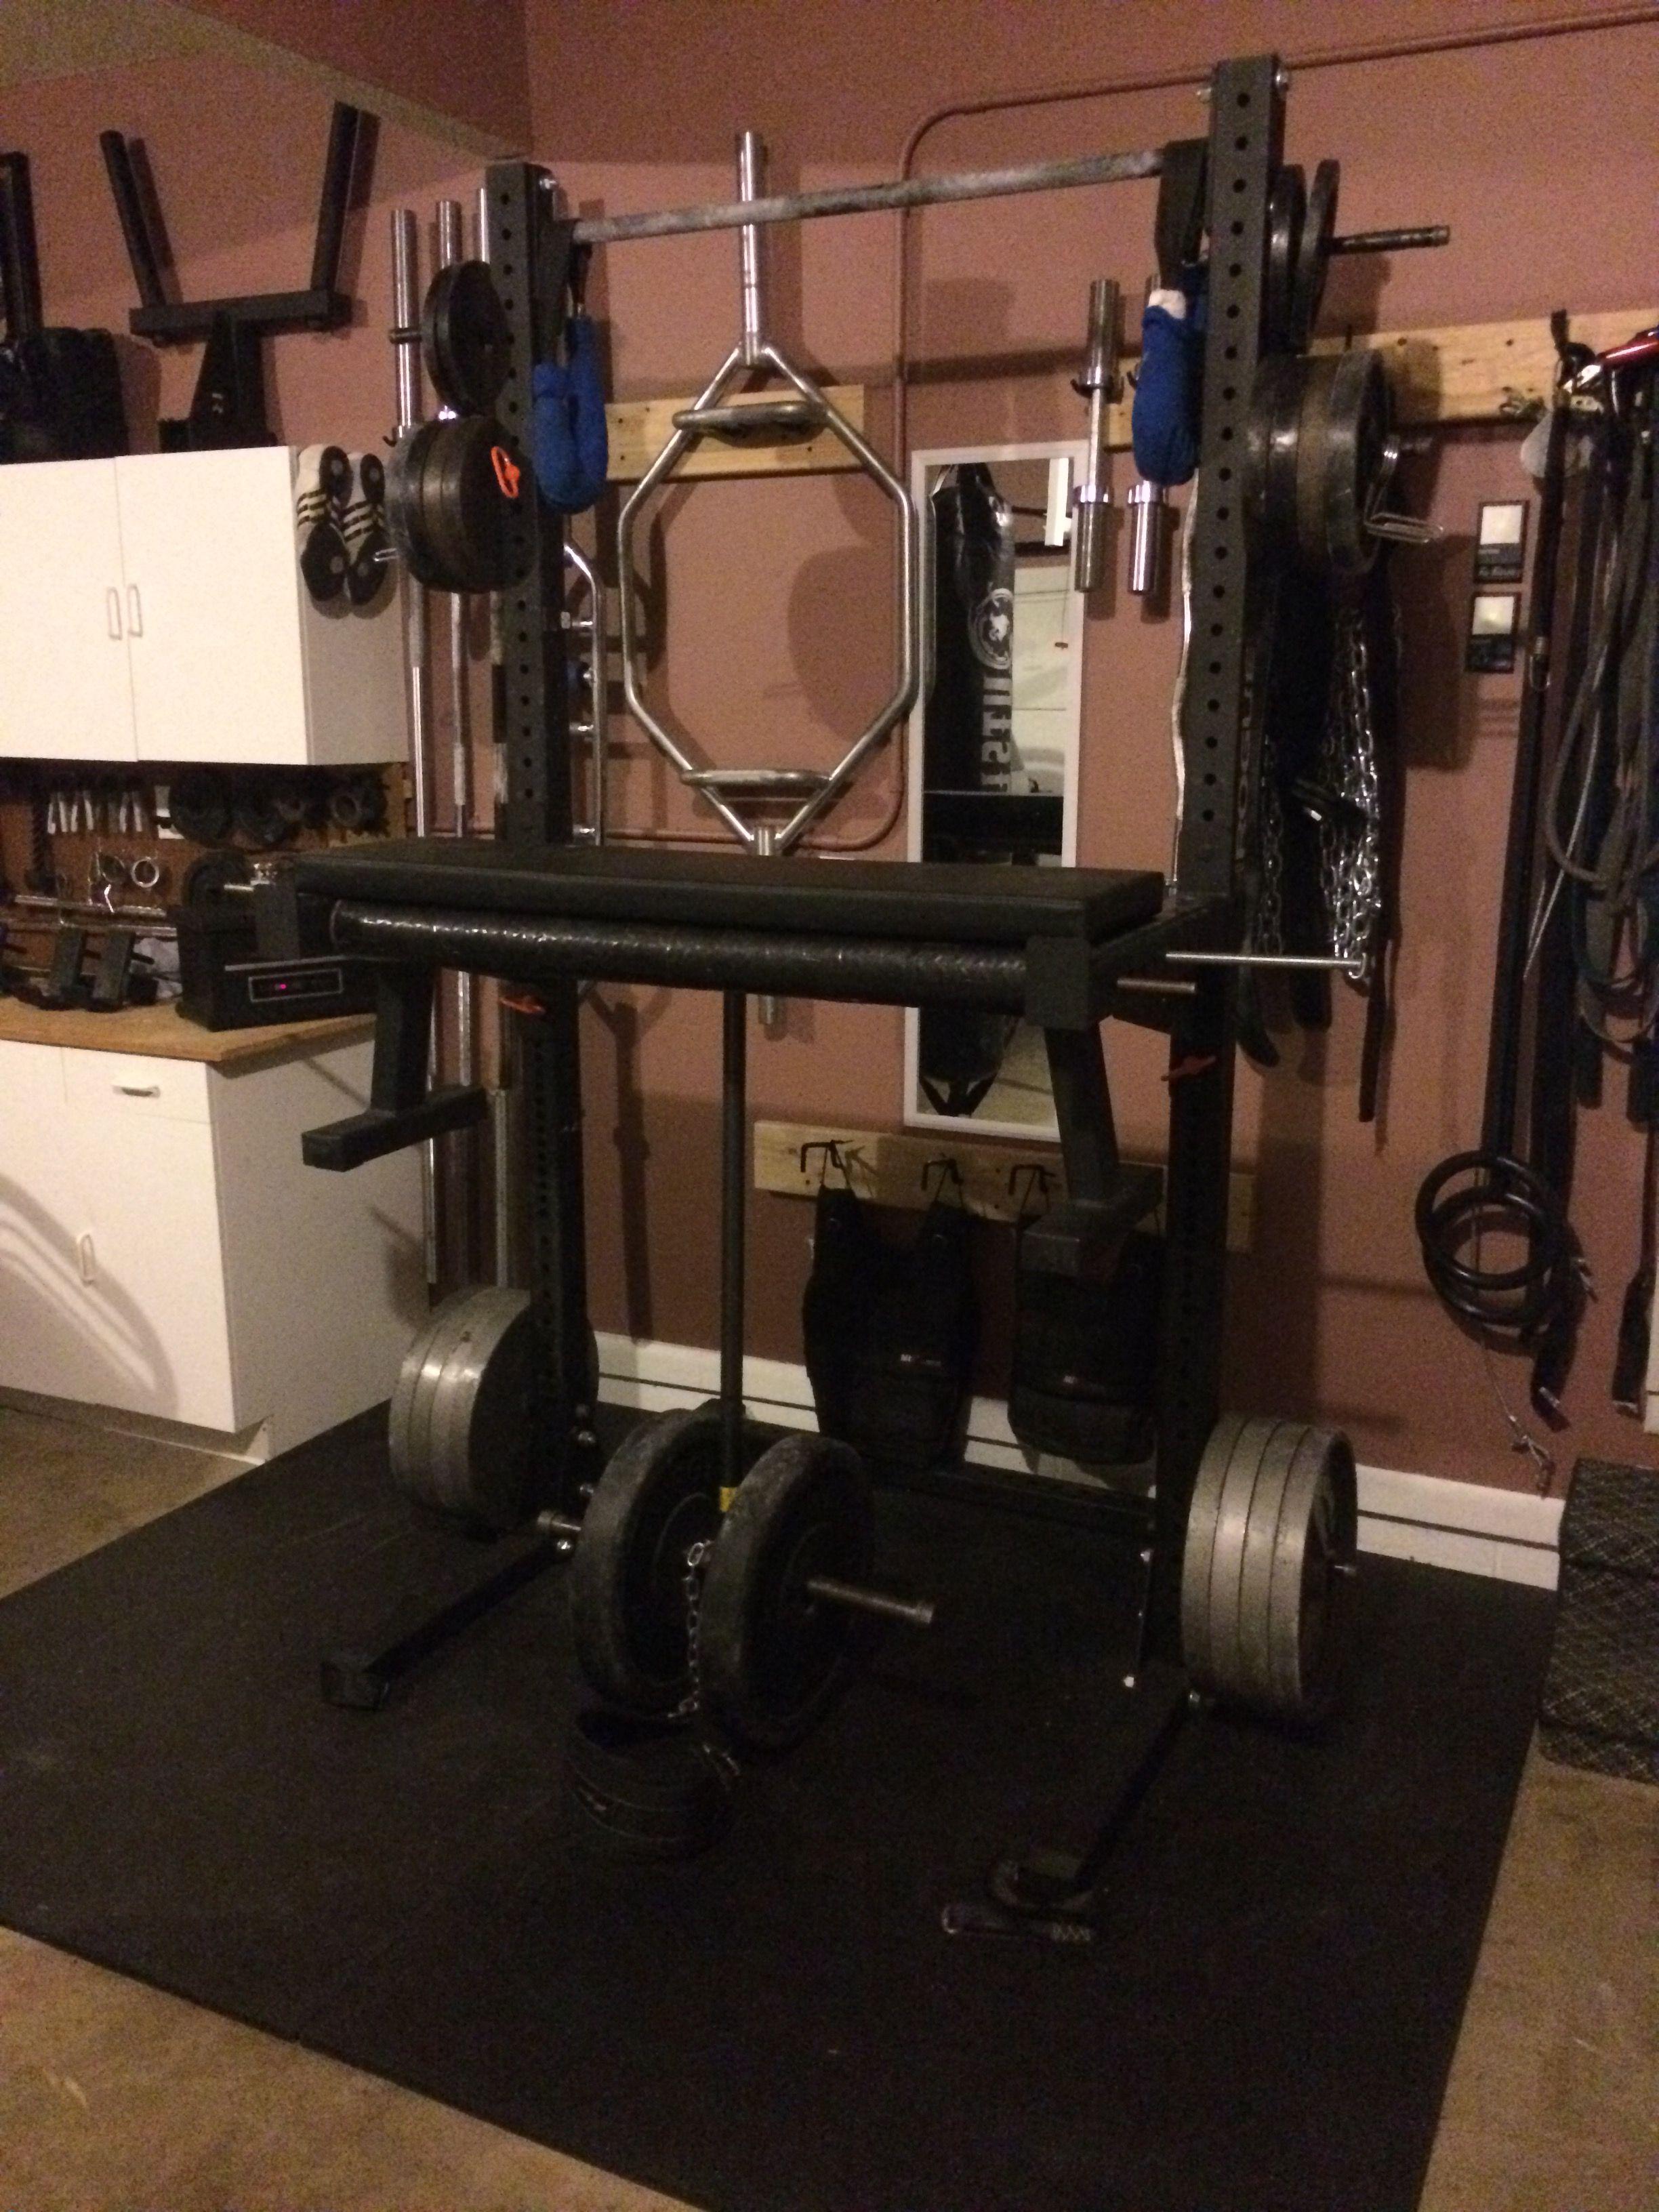 My reverse hyper home gym gym equipment and gym